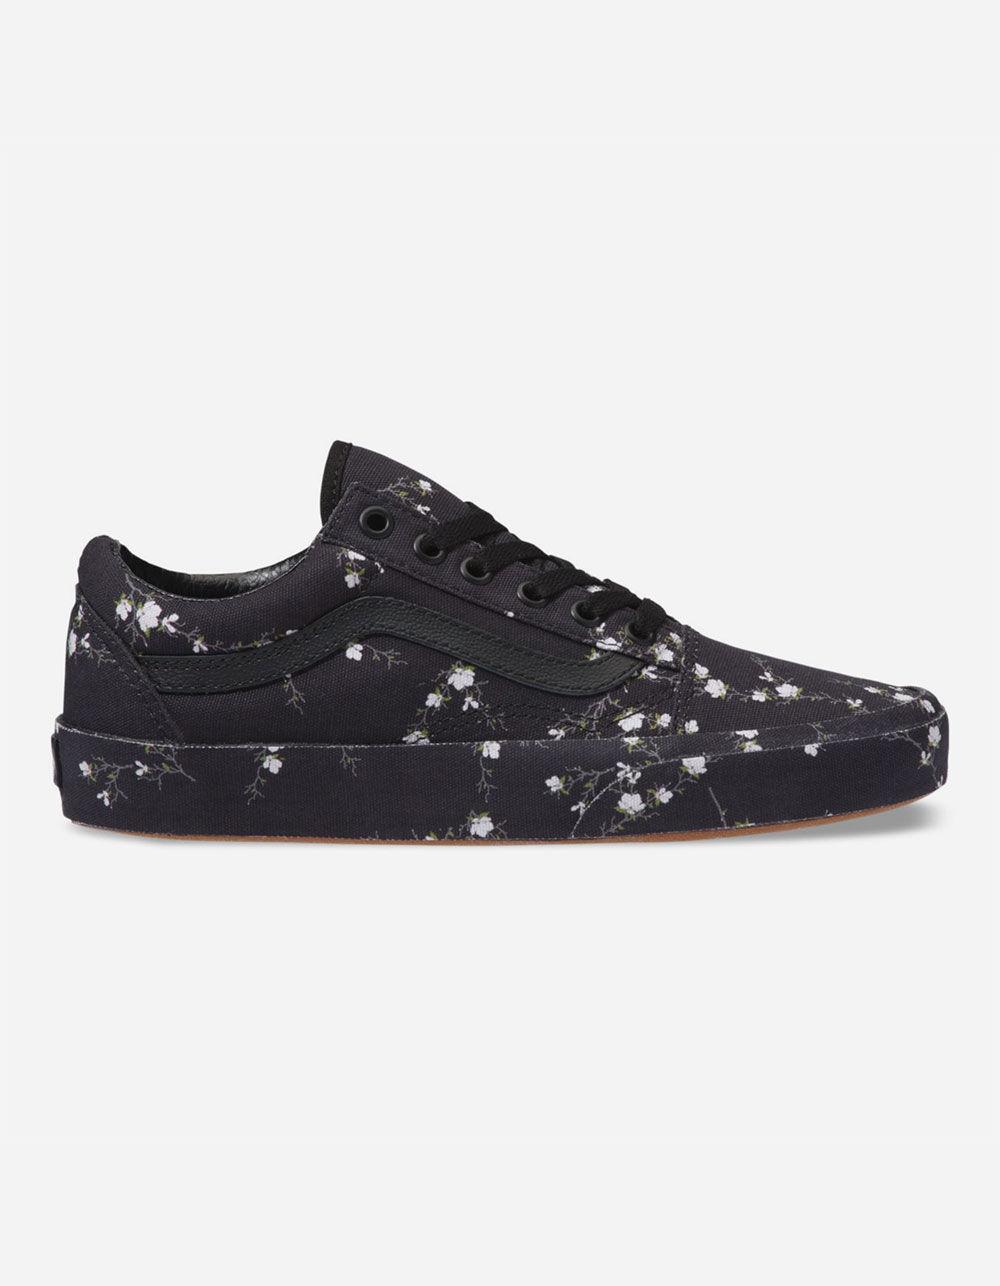 ed979fc1be1 Lyst - Vans Old Skool Midnight Floral Womens Shoes in Black